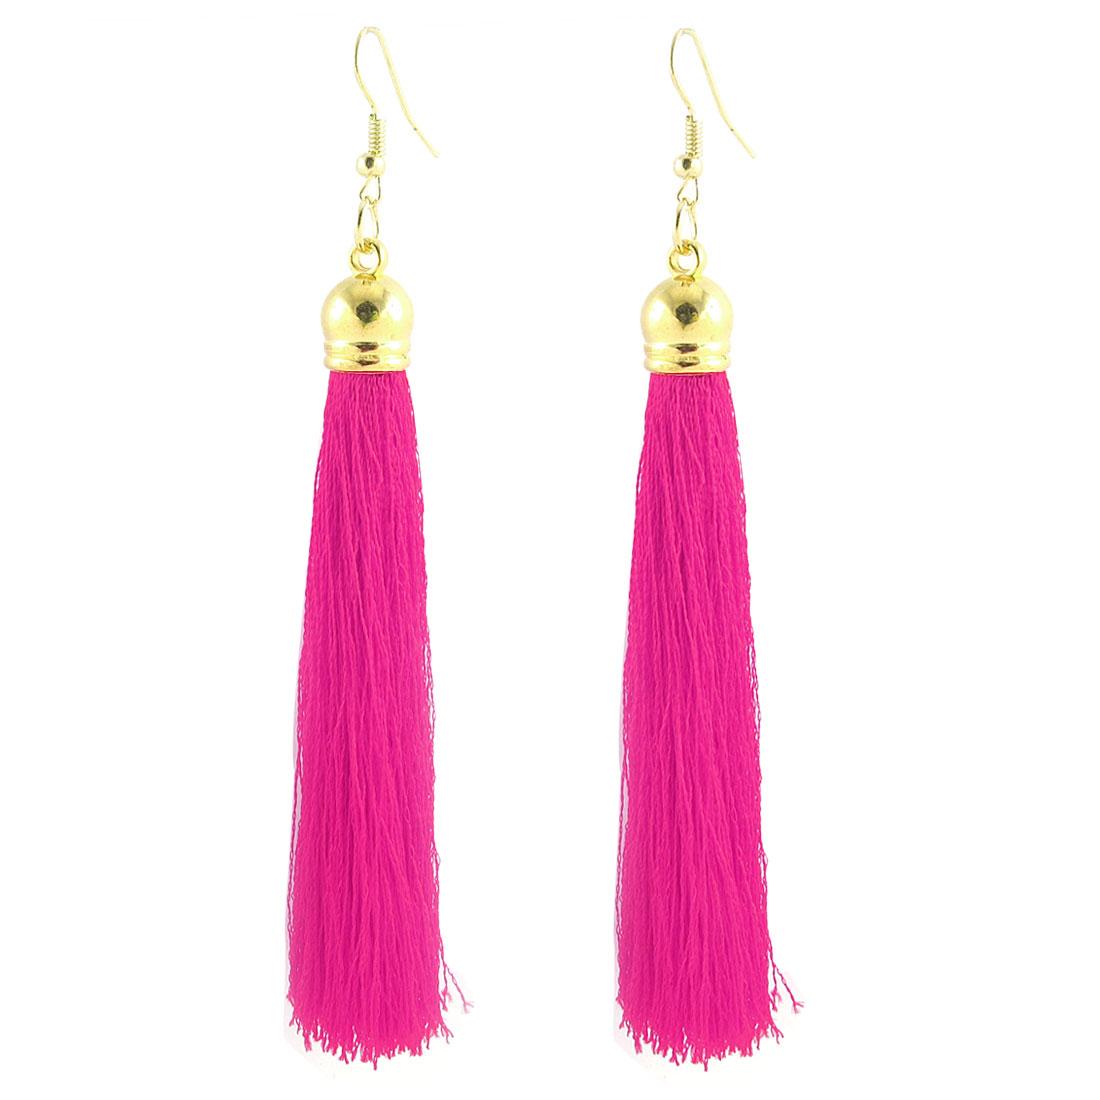 Lady Women Nylon Tassel Fringe Charm Bead Decor Hook Earrings Eardrop Fushcia Pair